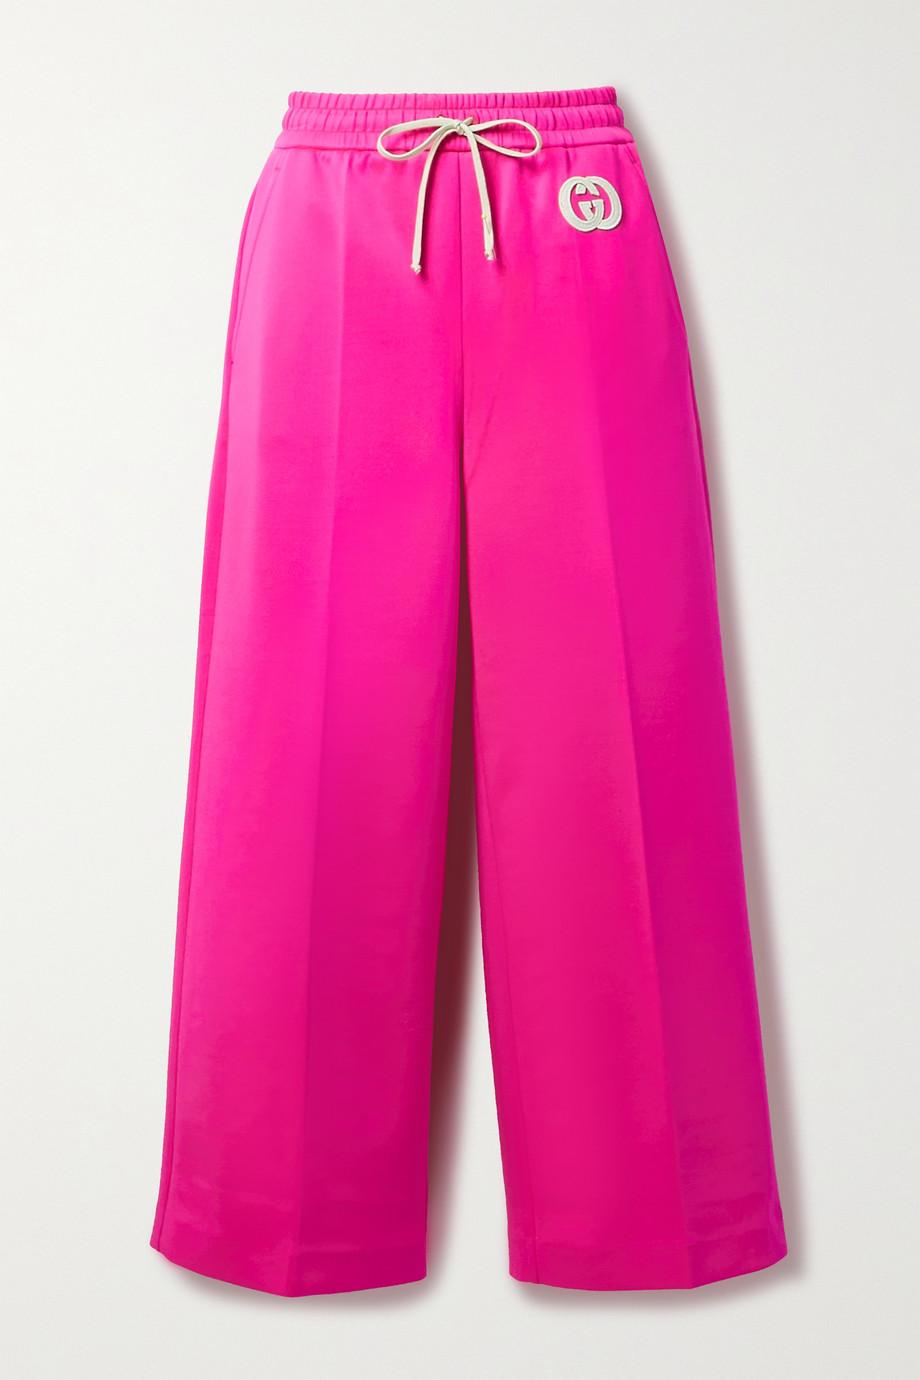 Gucci Cropped appliquéd neon stretch-jersey wide-leg track pants